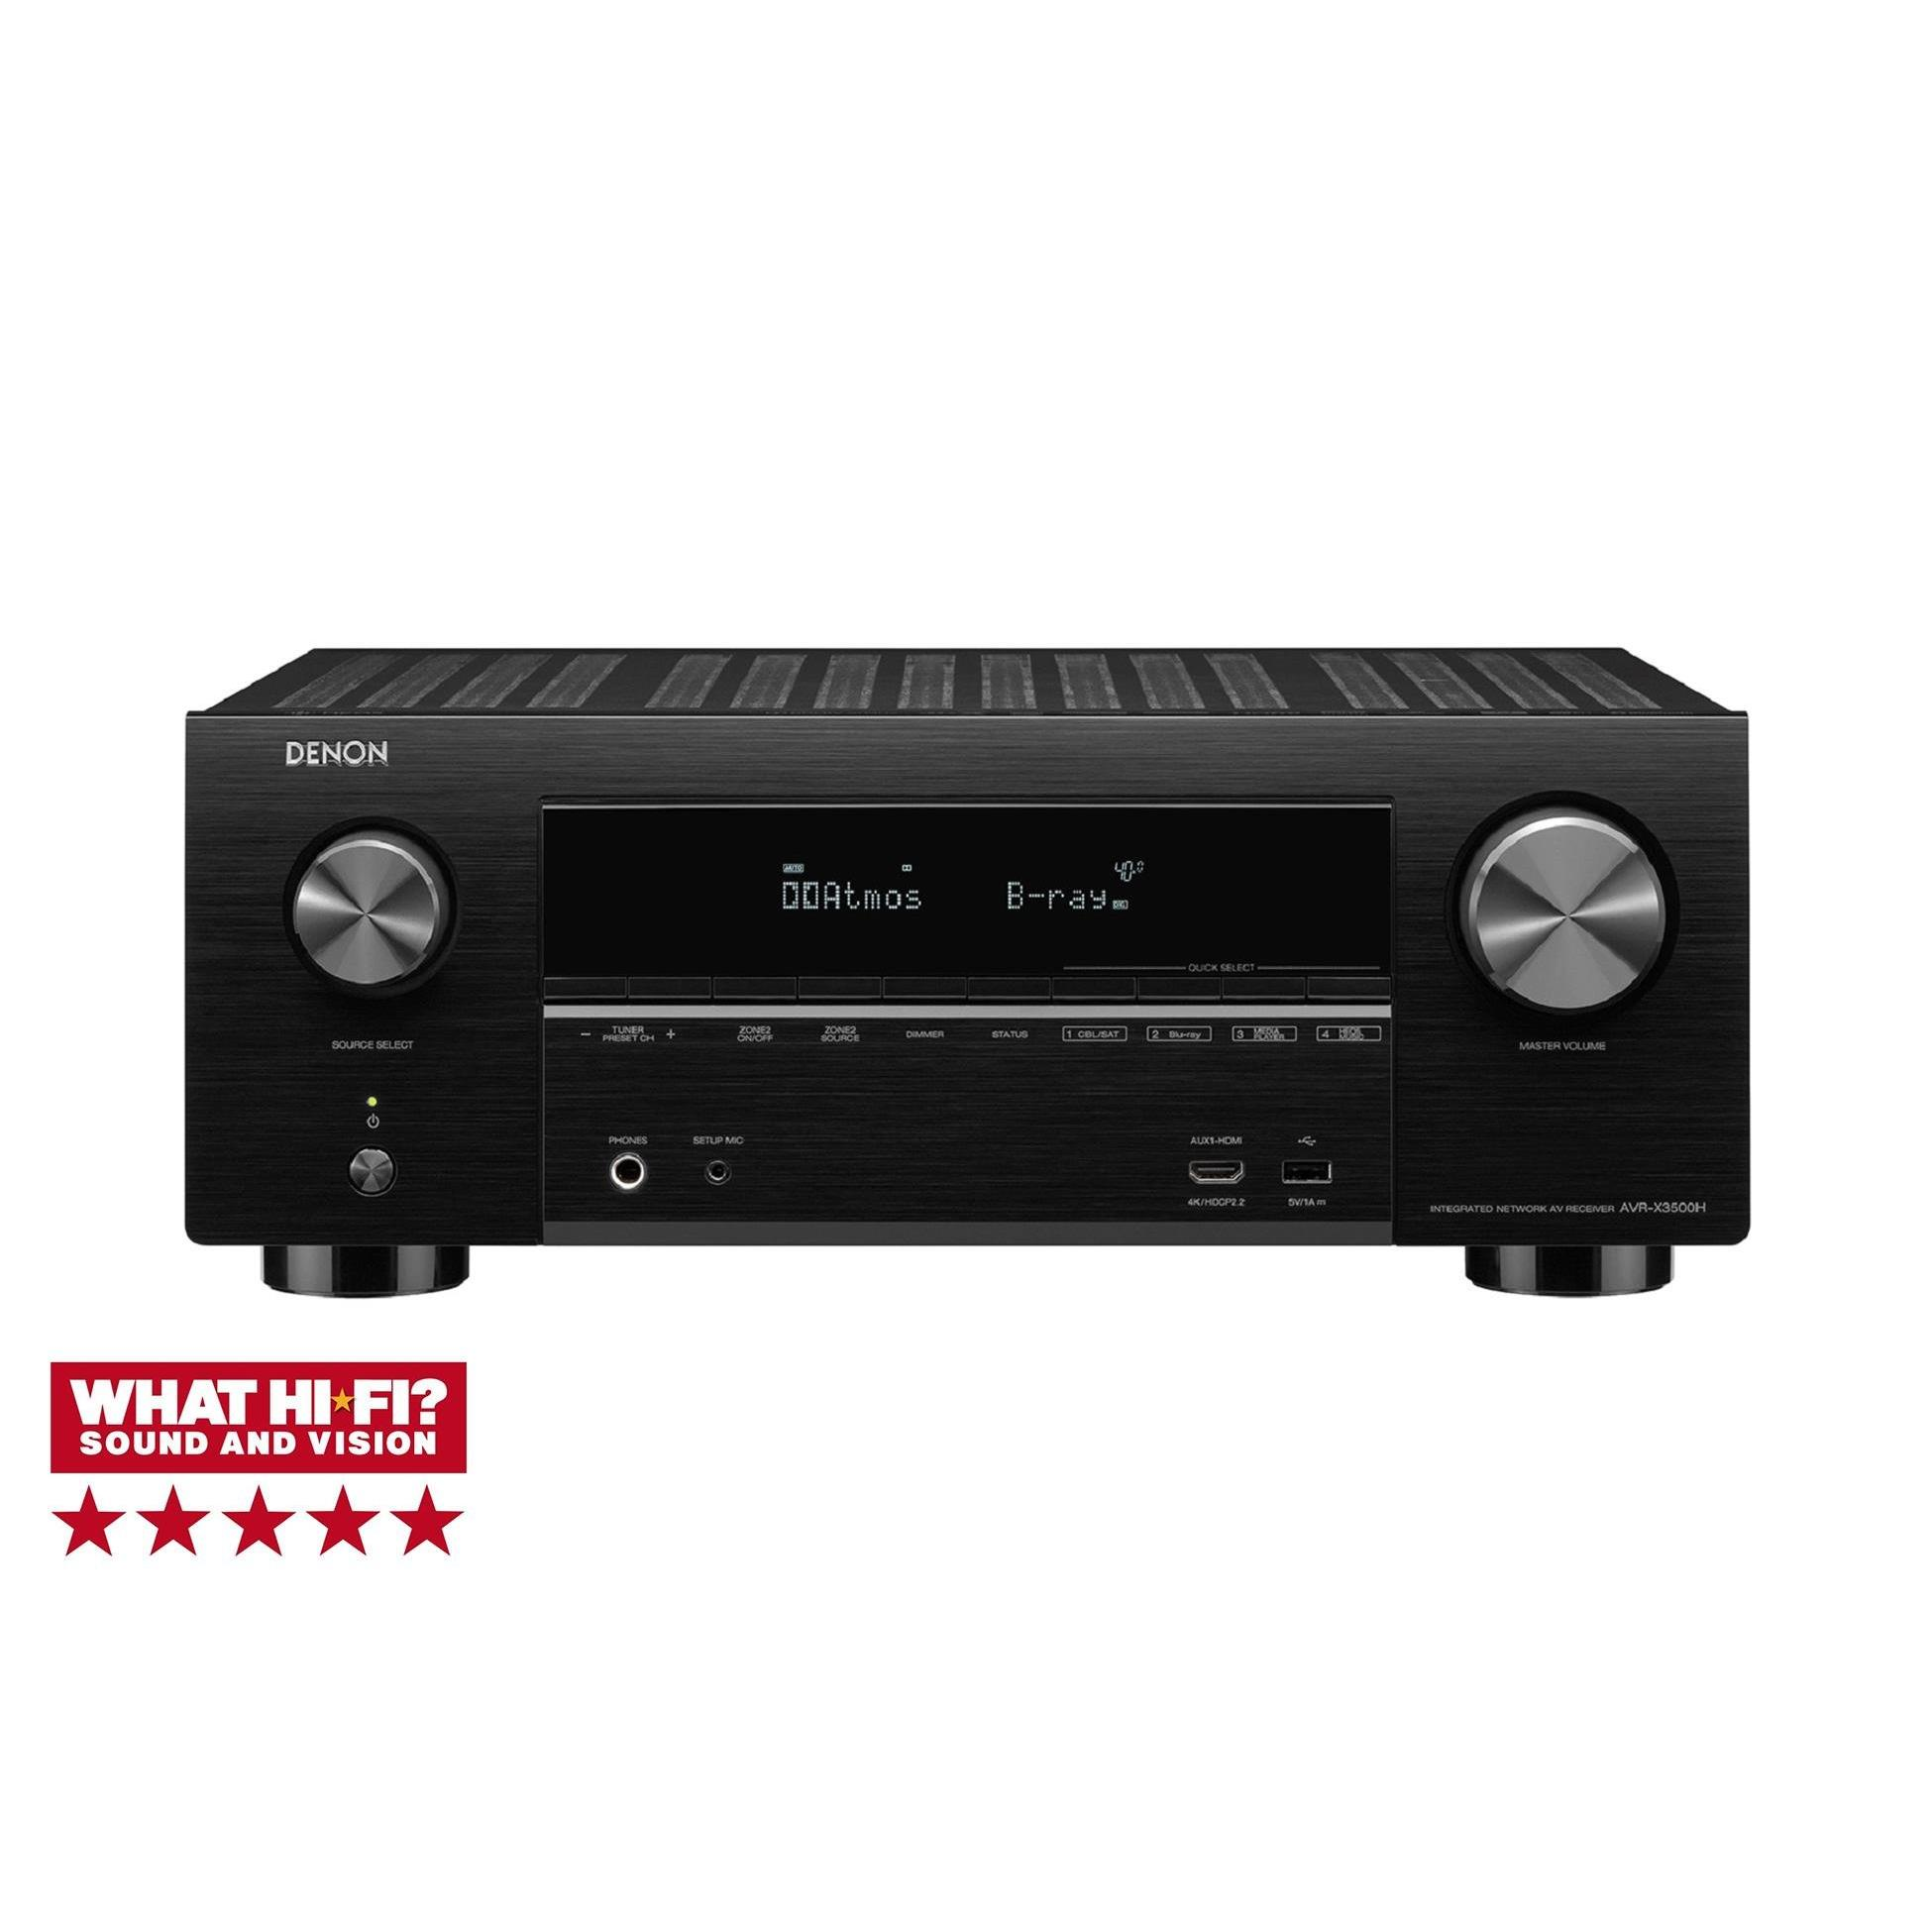 Richer Sounds Ireland - Denon AVRX3500H